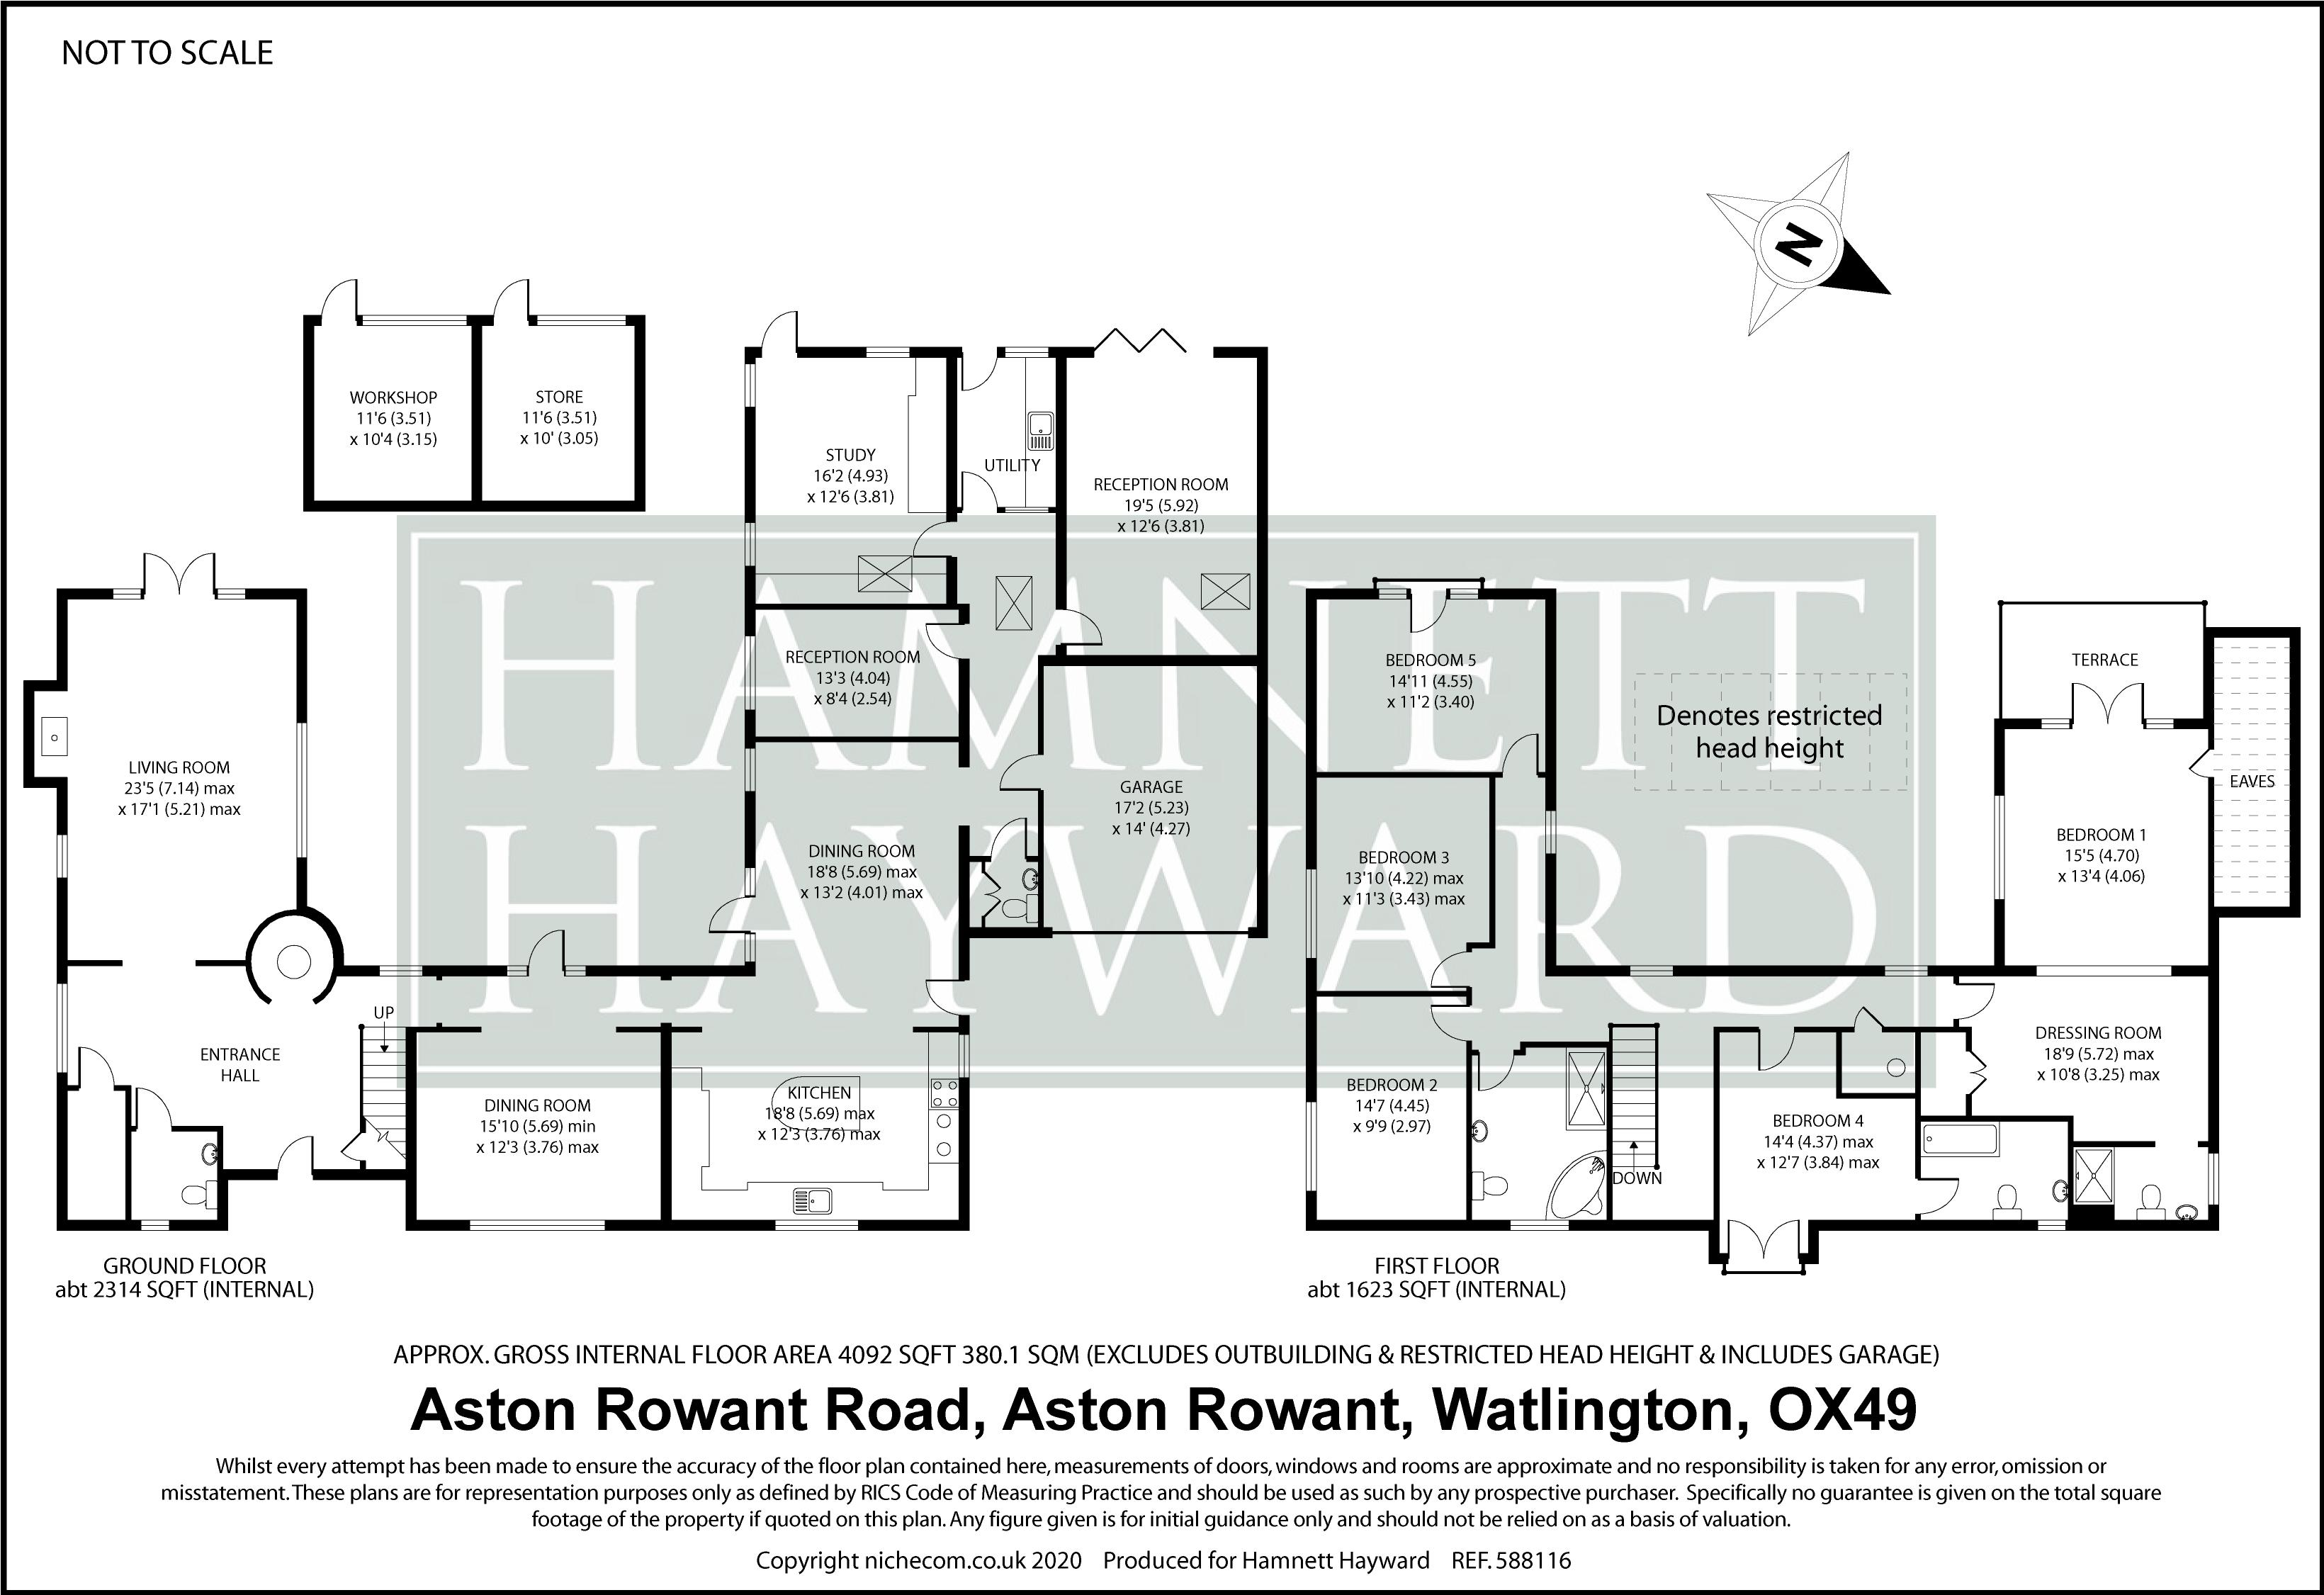 Aston Rowant Road Aston Rowant